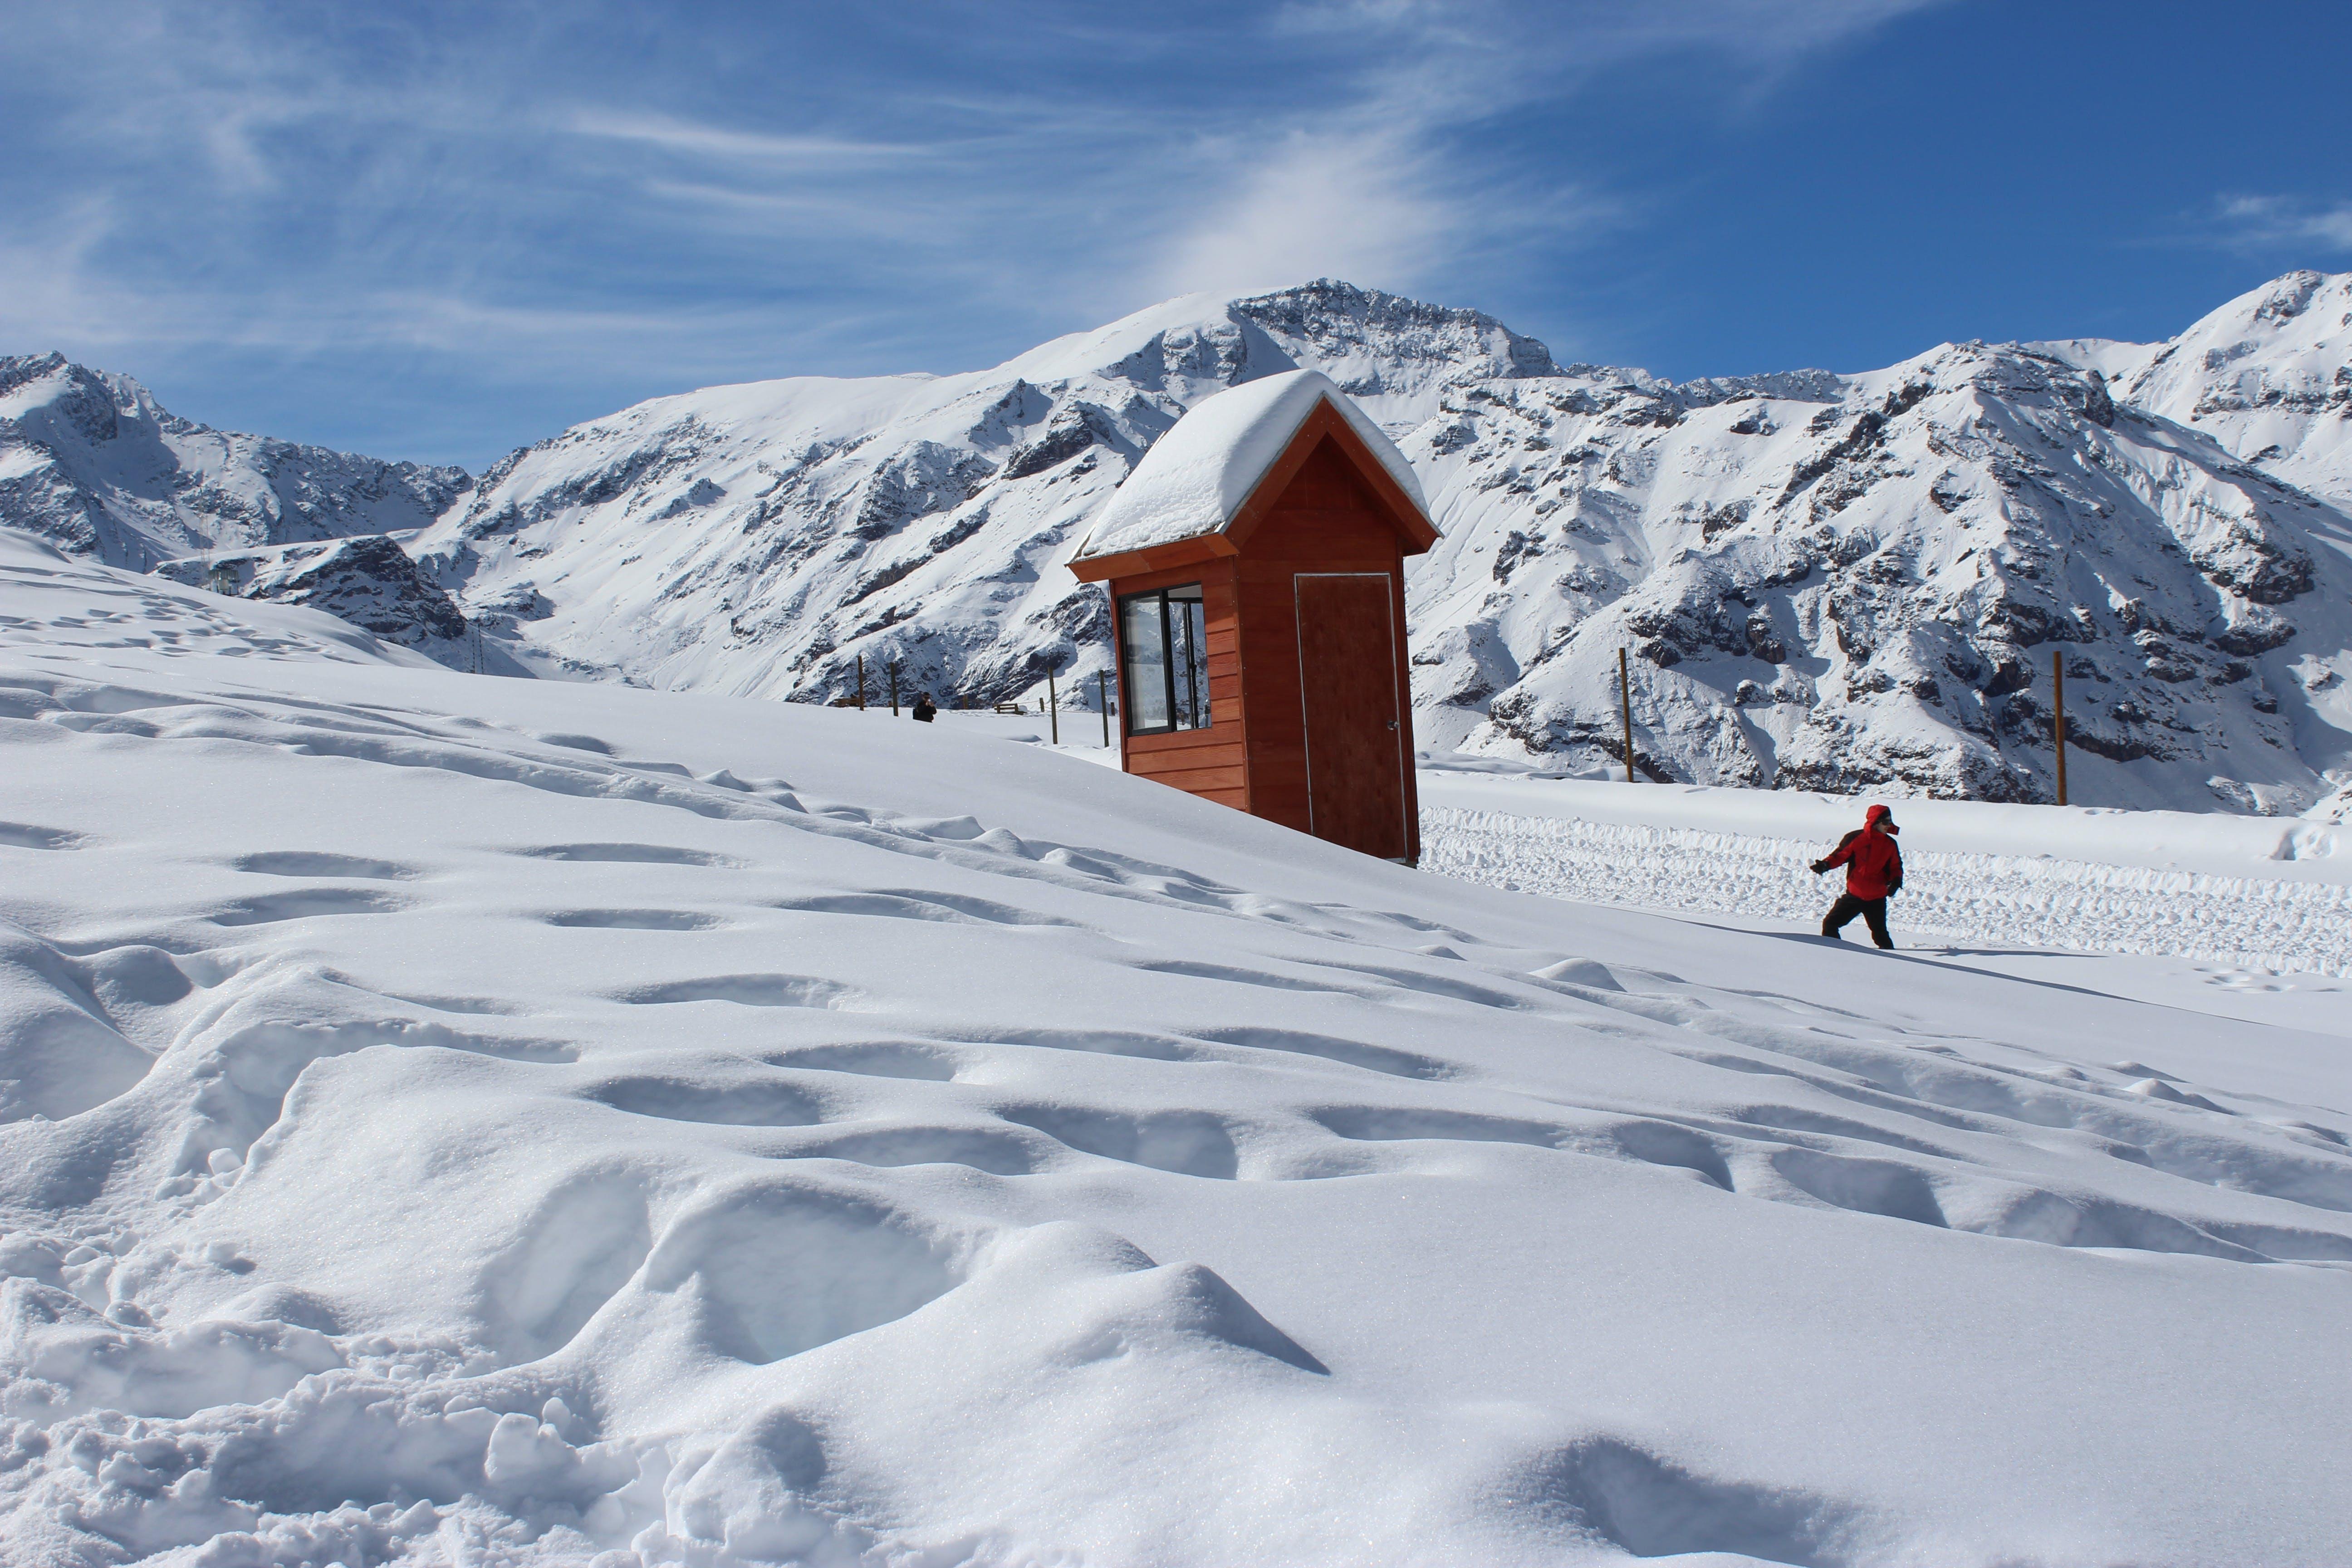 Kostenloses Stock Foto zu abhang, bergab, berge, einfrieren